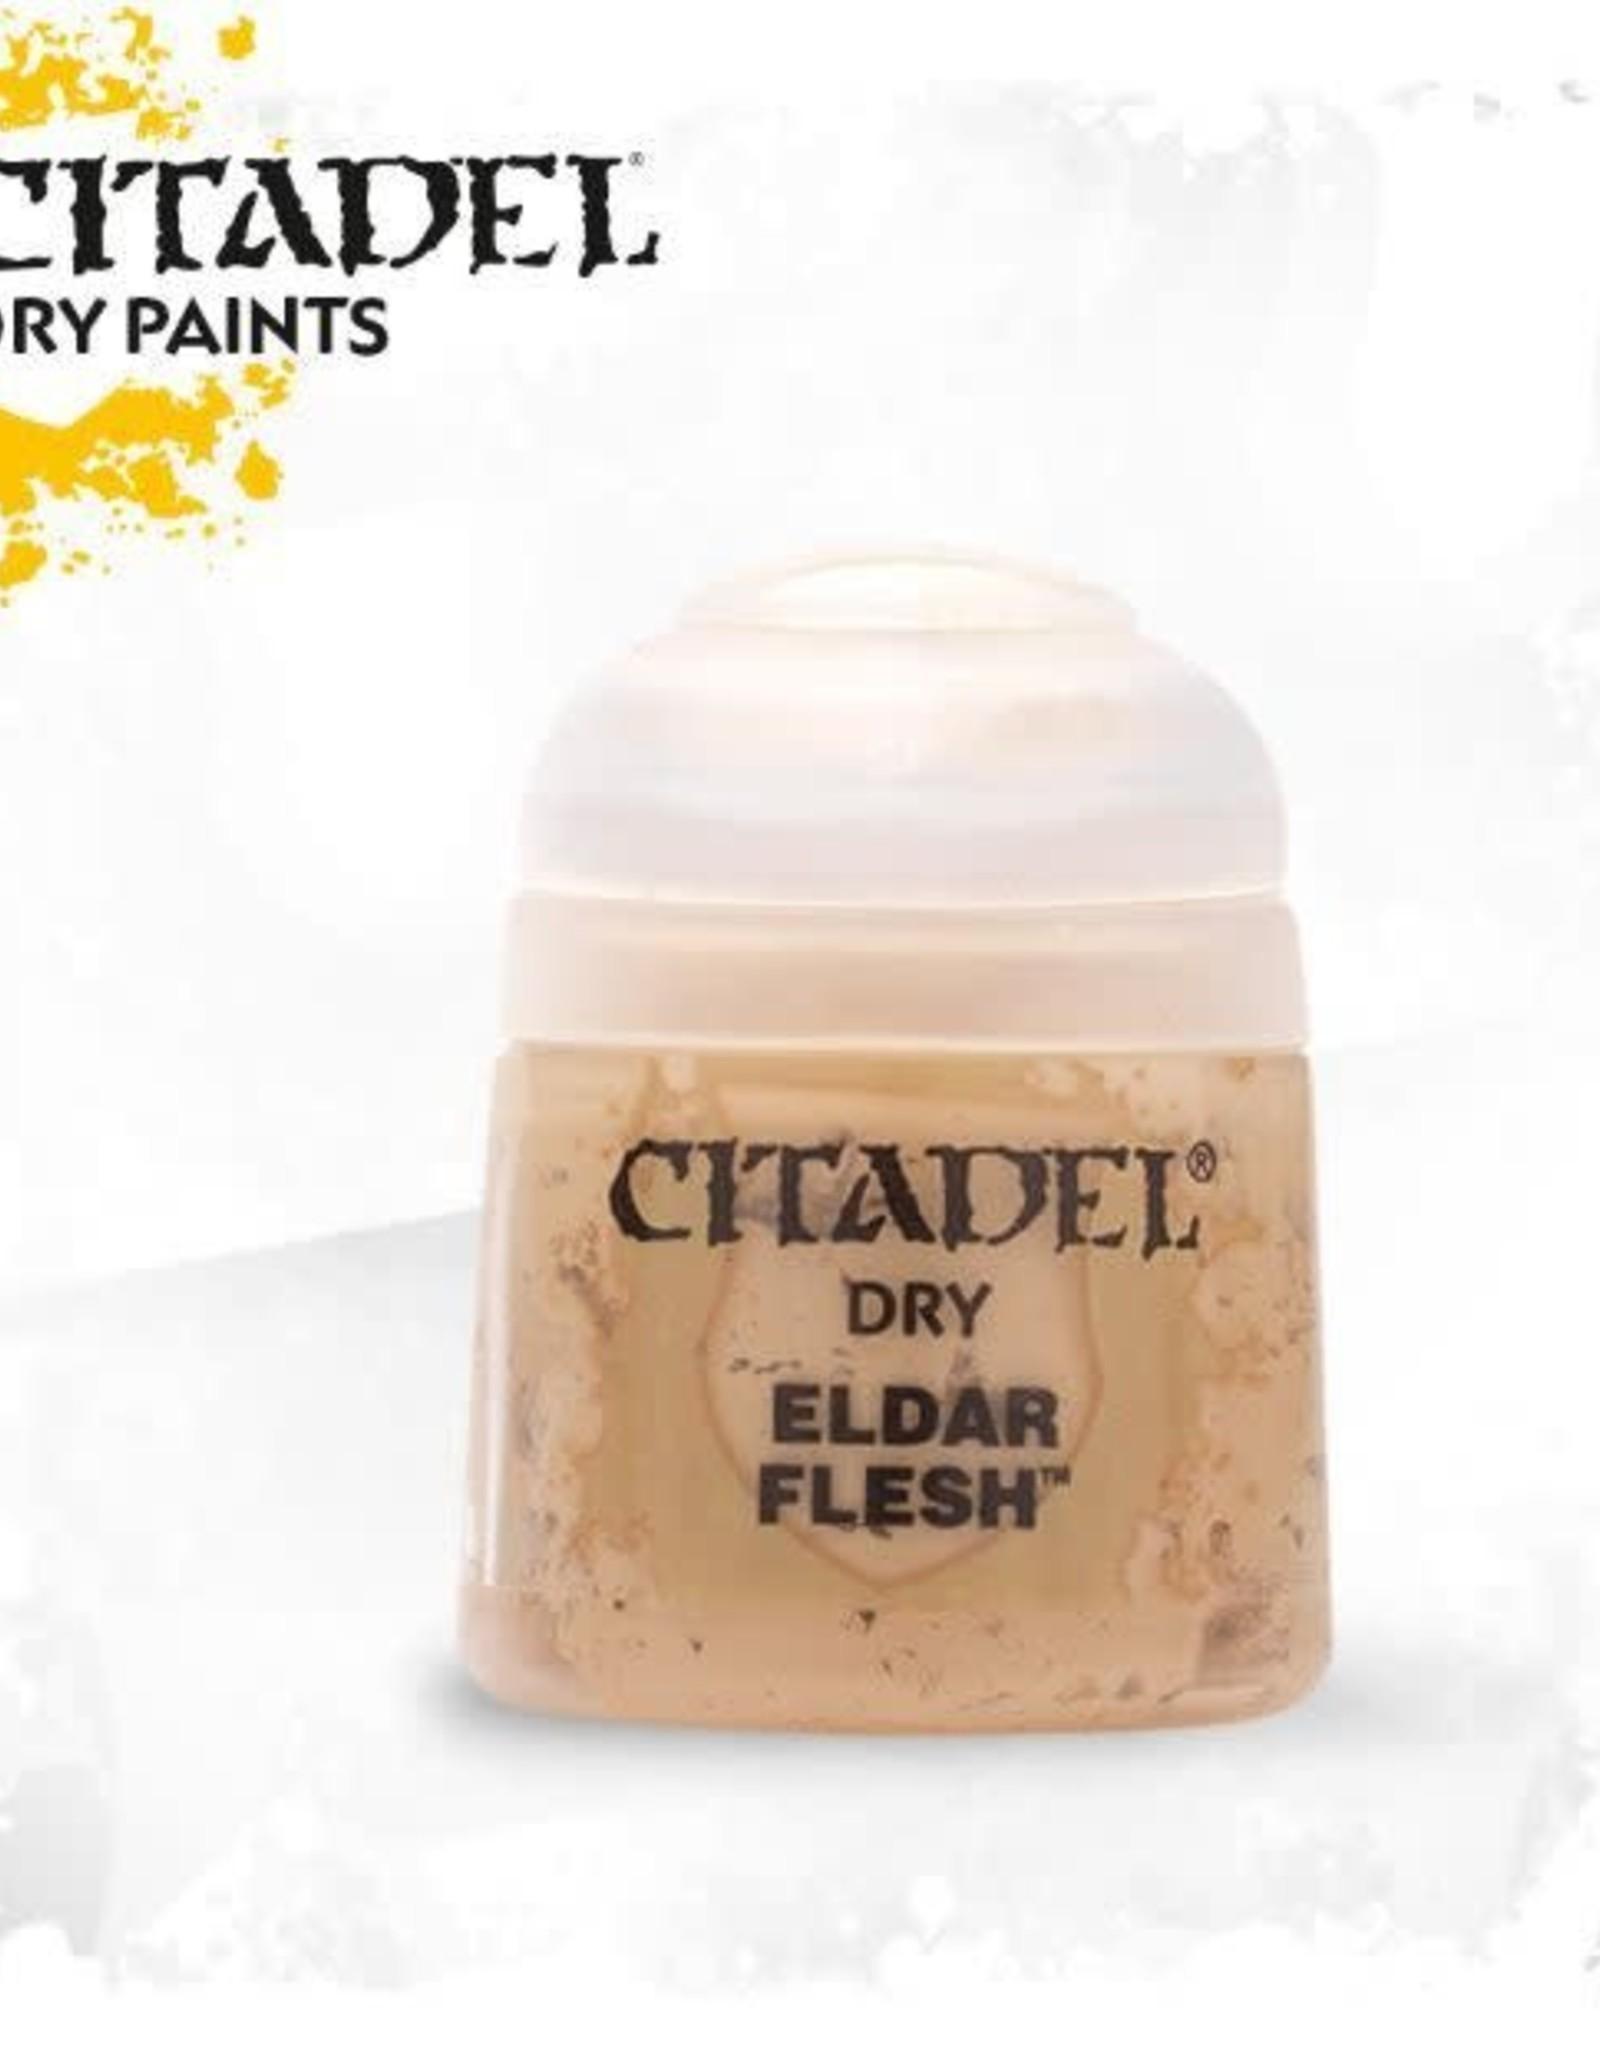 Games Workshop Citadel Paint: Dry - Eldar Flesh